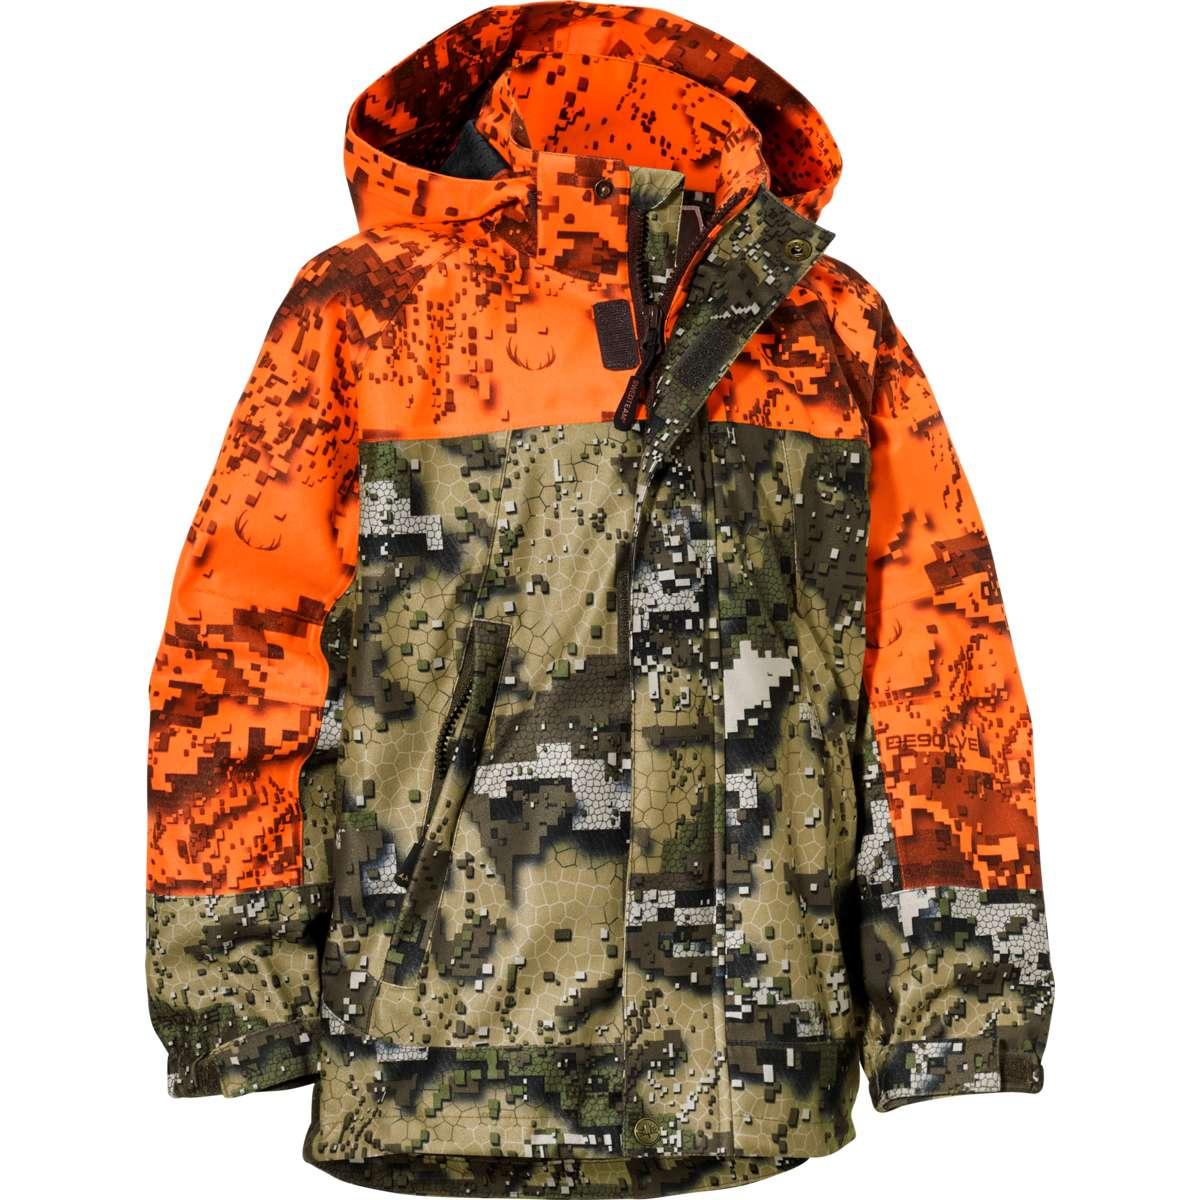 Swedteam Ridge JR Jacket Desolve Fire